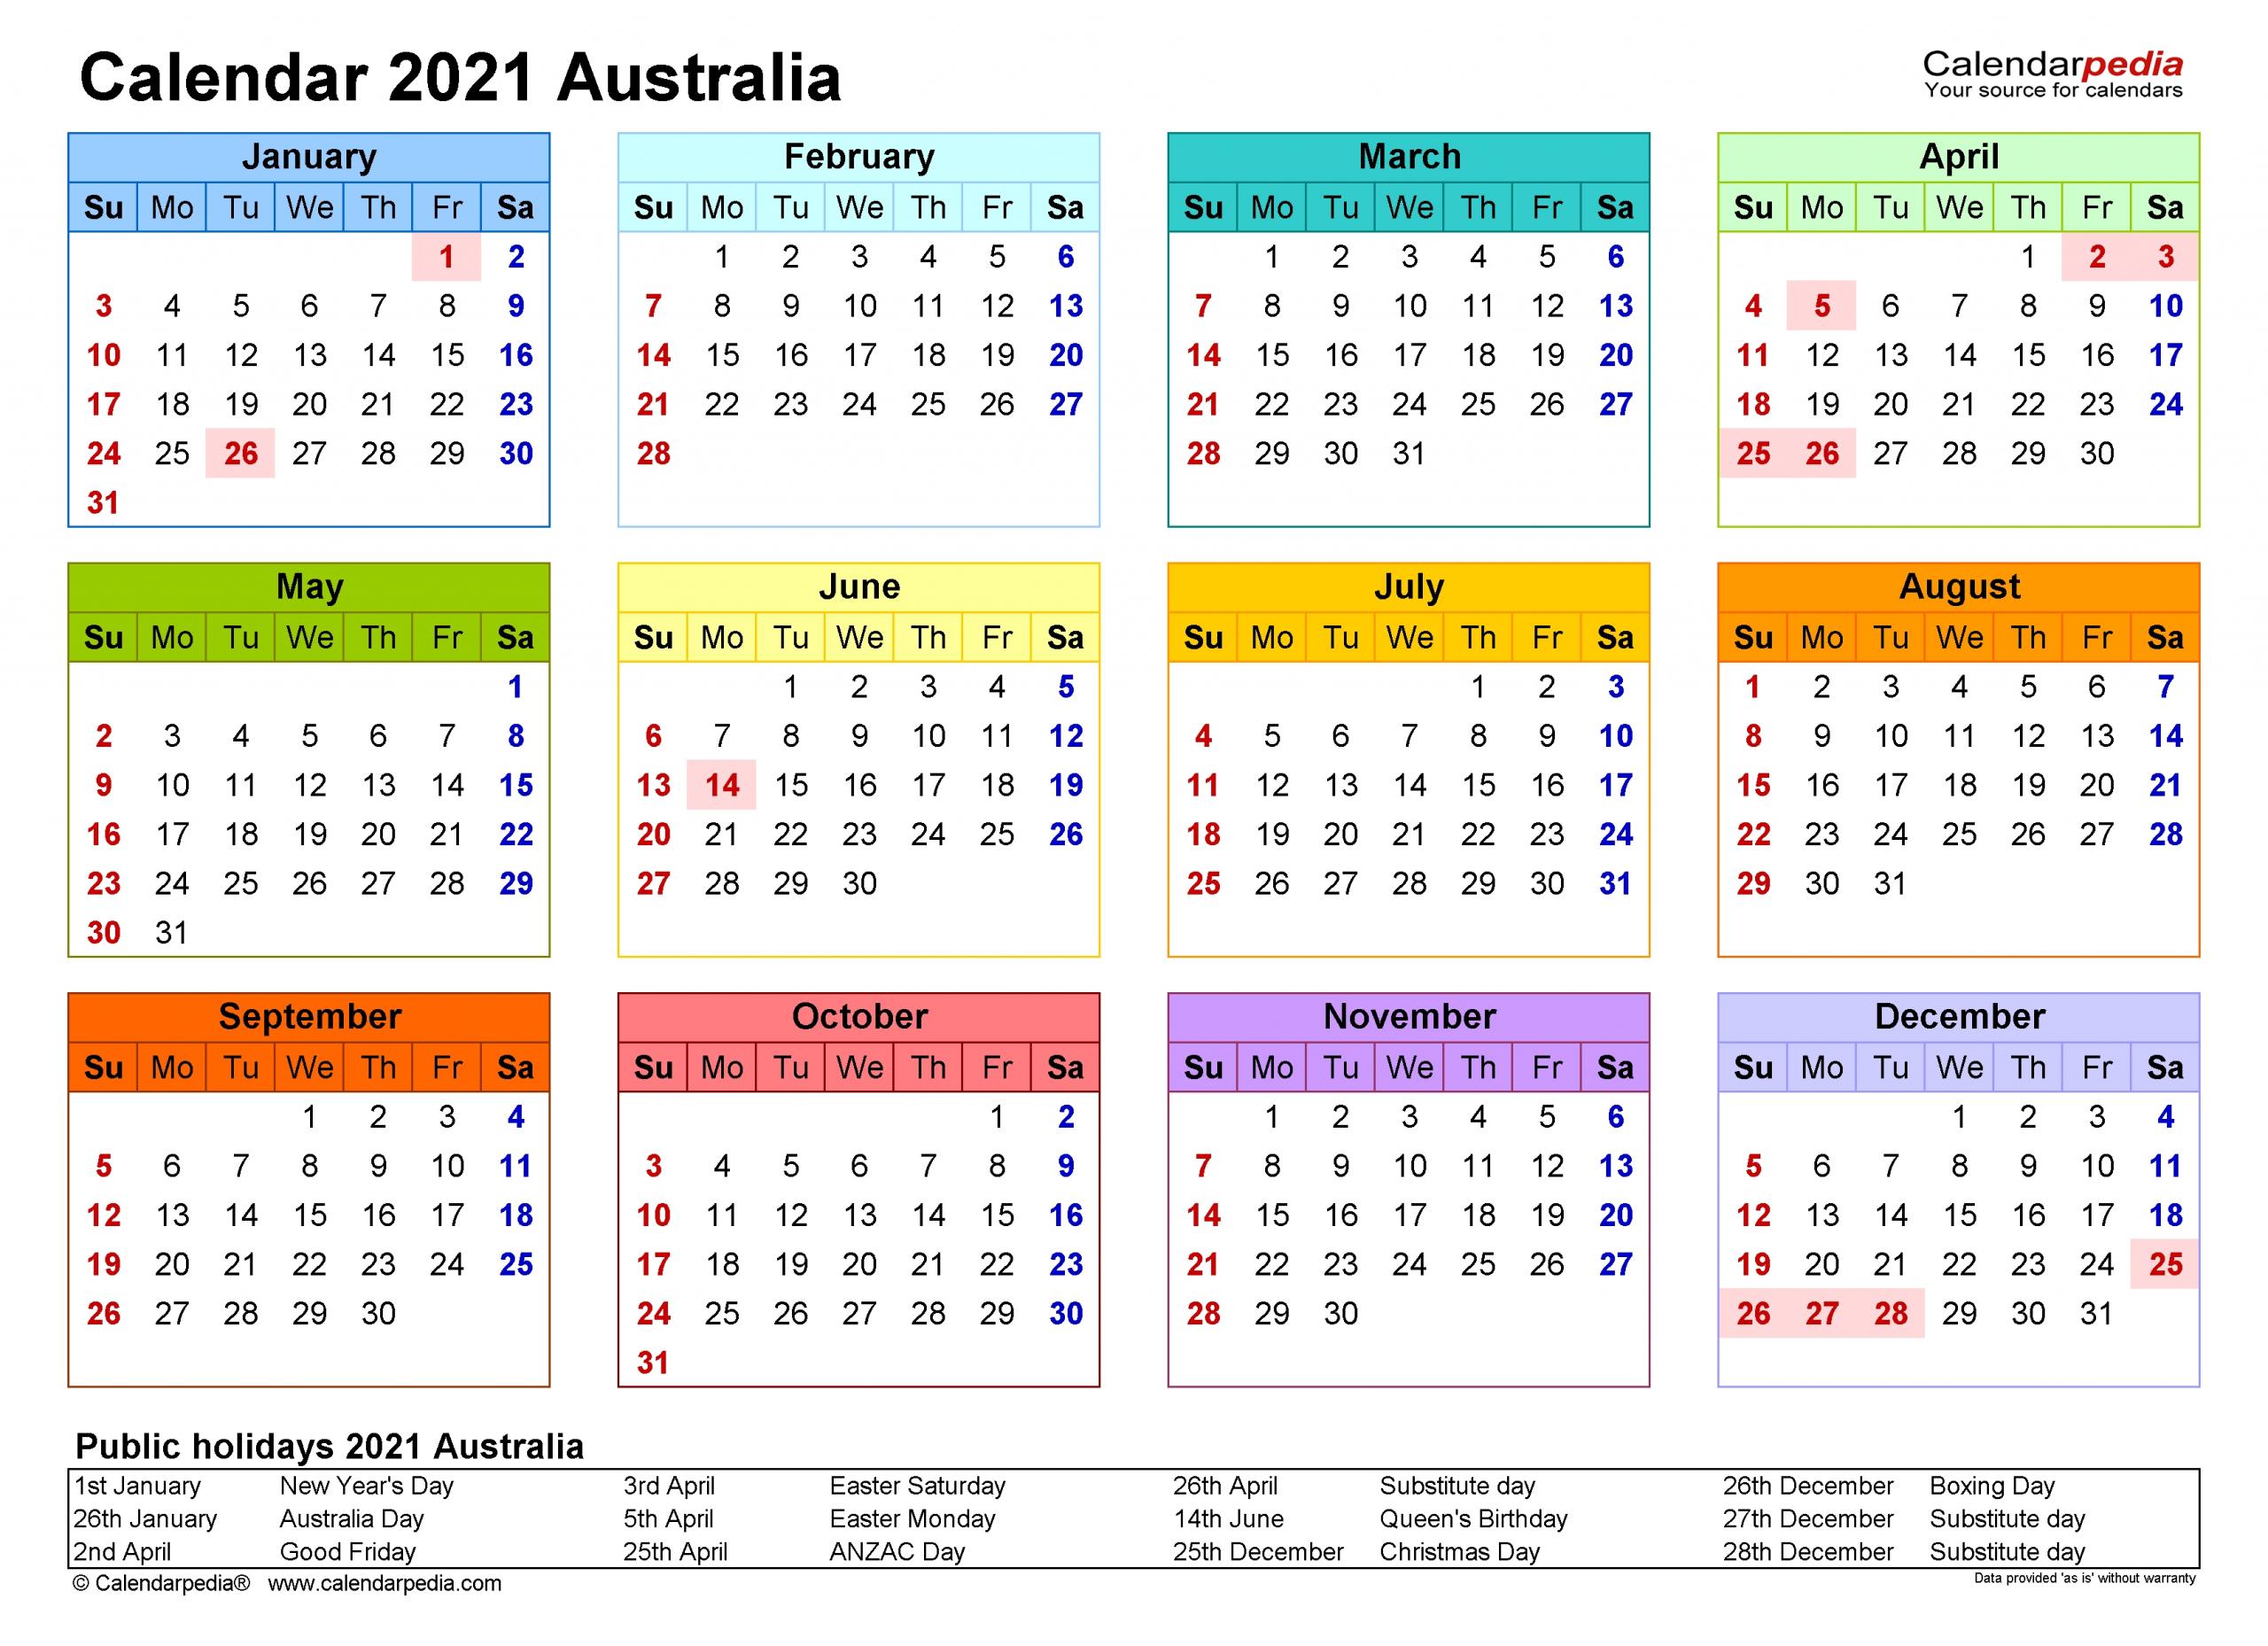 Australia Calendar 2021 - Free Printable Pdf Templates  Fiscal Year 2021 Australia Calendar